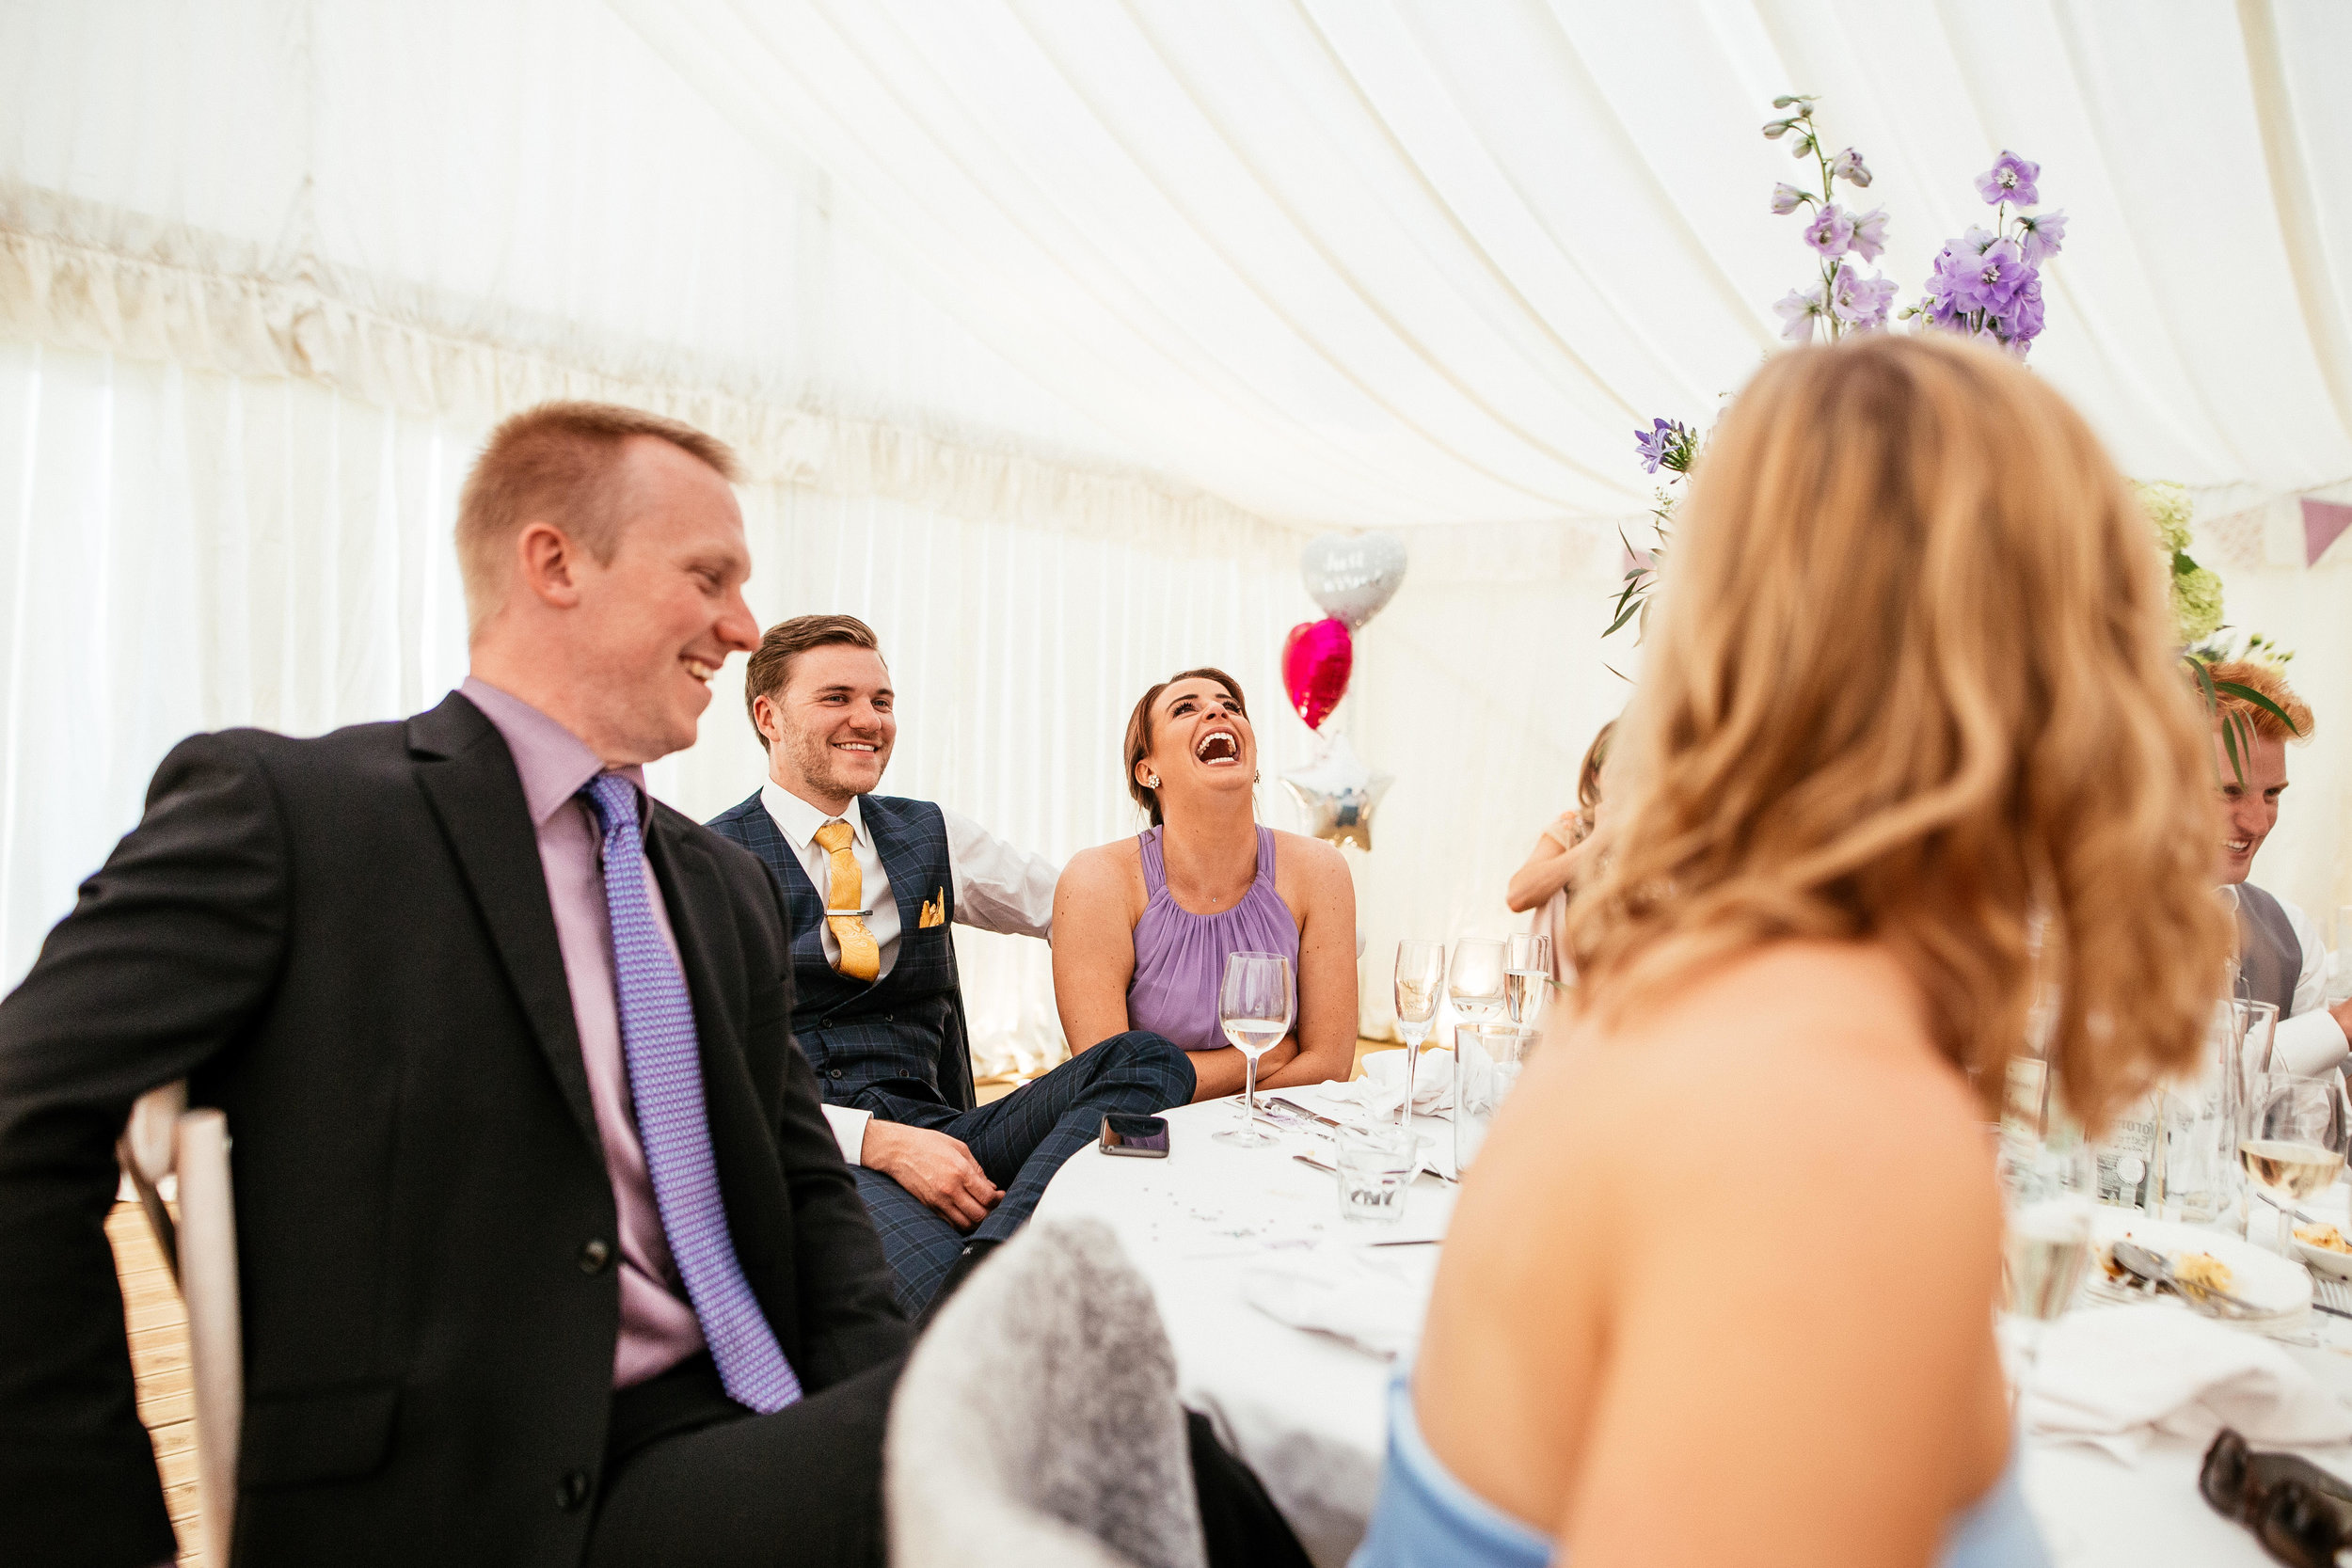 Becky-and-Sam-Wedding-Highlights-69.jpg